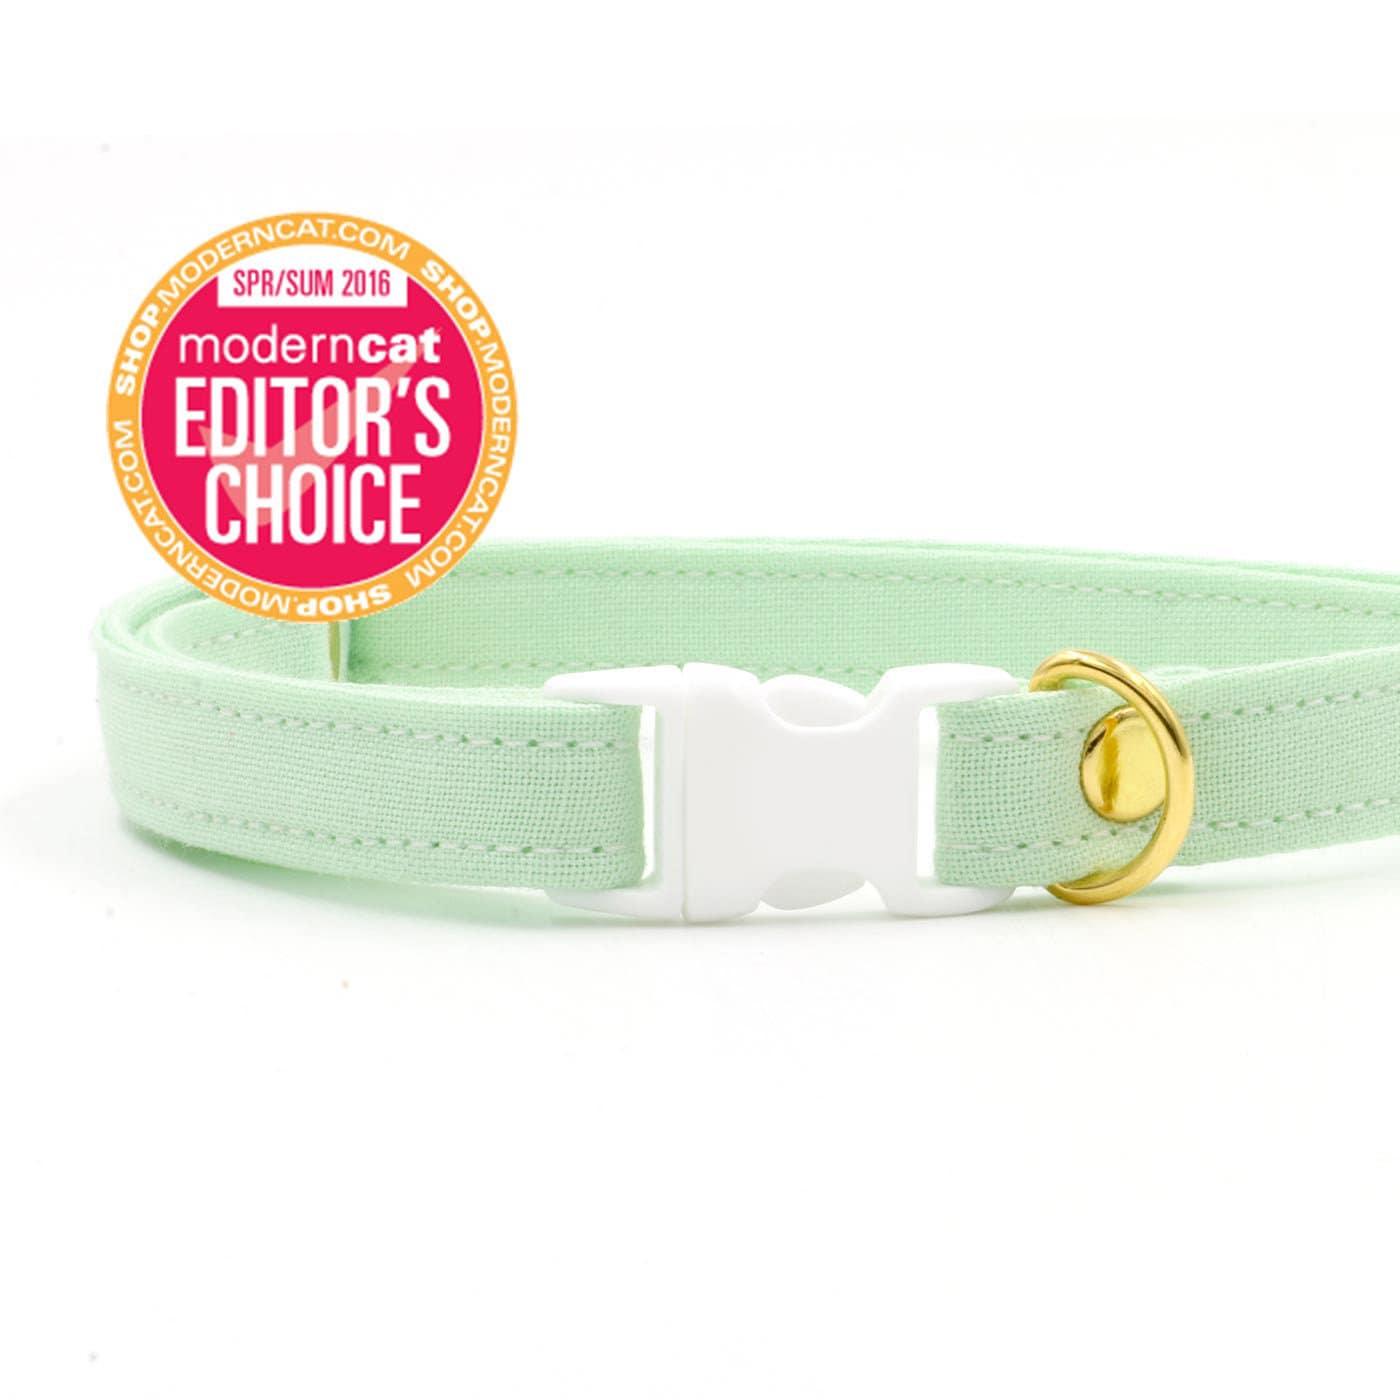 ce33eb94b7e9 Mint Green Cat Collar with Breakaway Safety Buckle Kitten